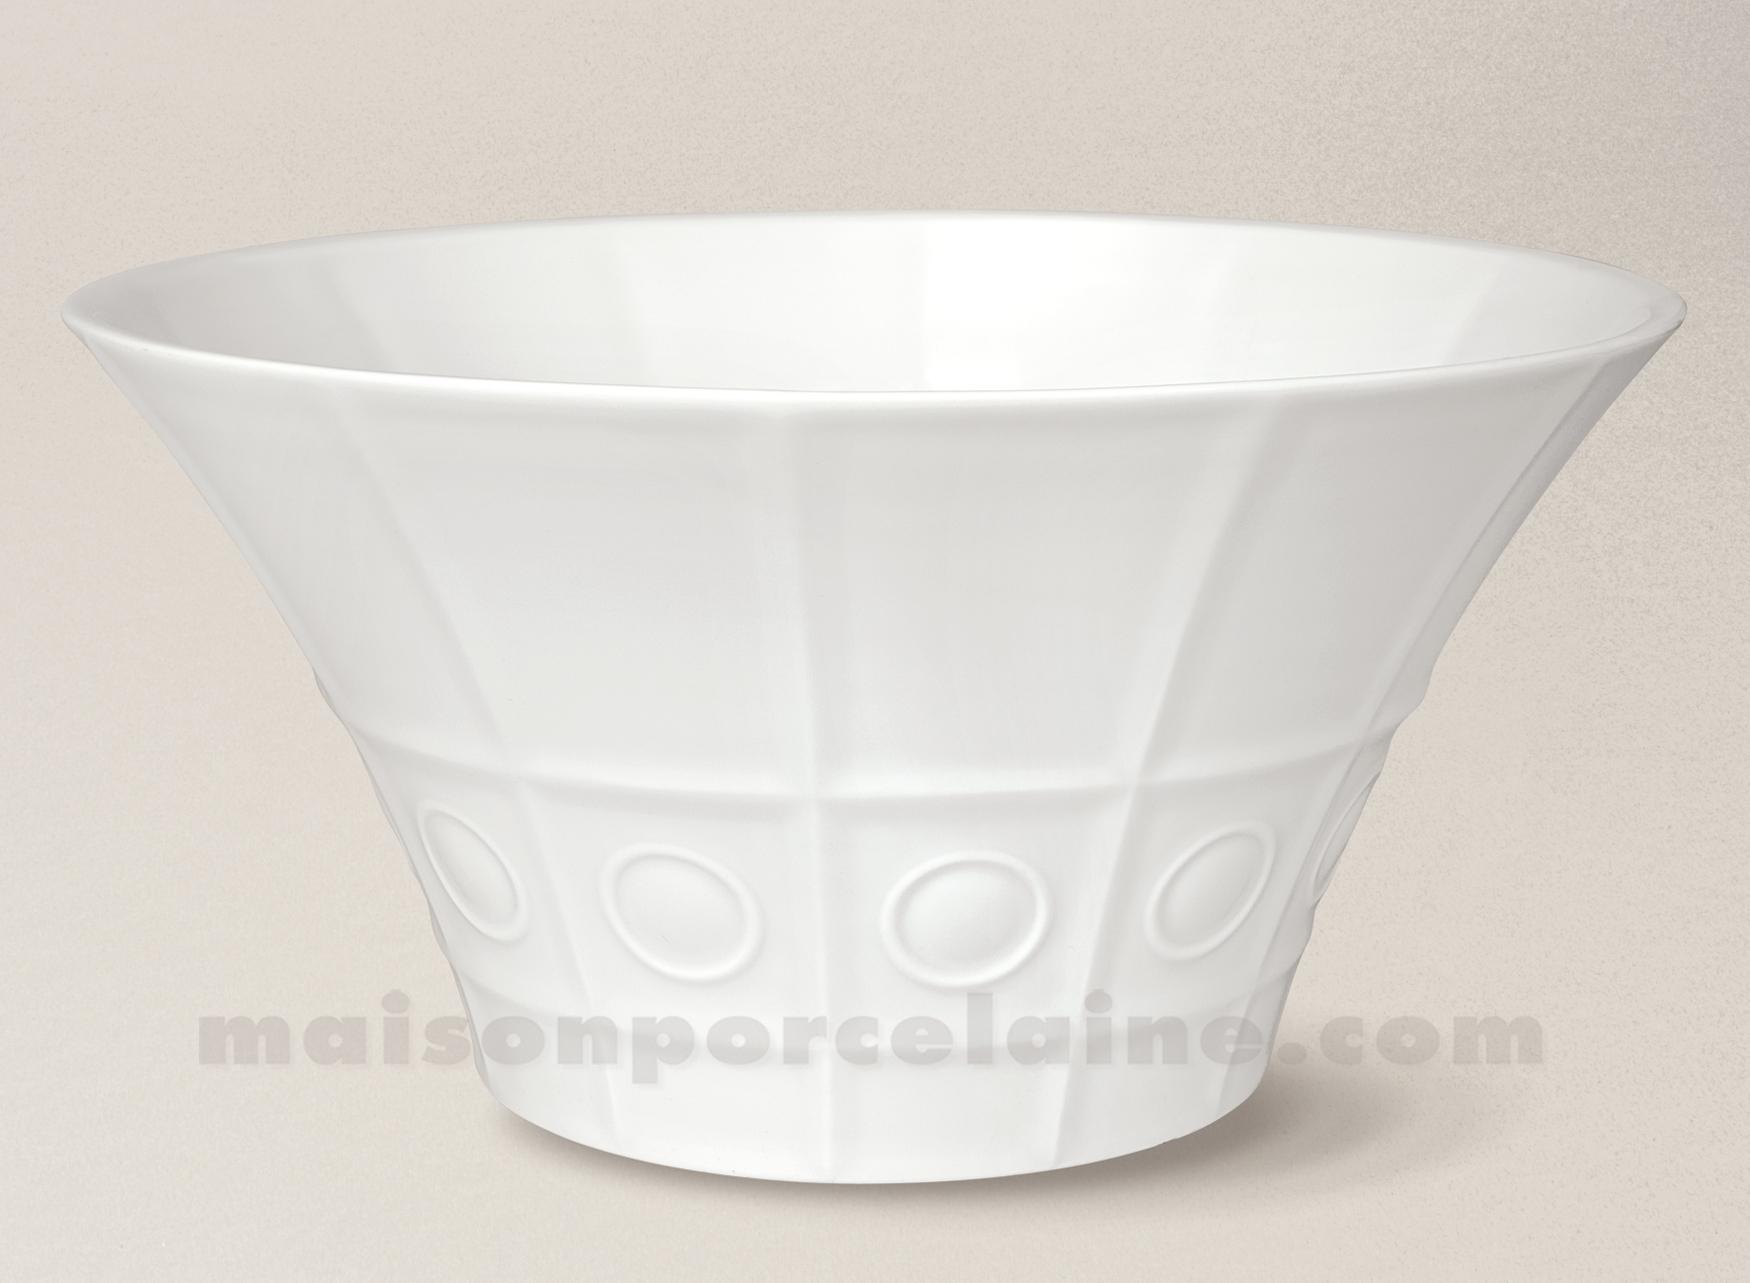 saladier limoges porcelaine blanche osmose gm maison de la porcelaine. Black Bedroom Furniture Sets. Home Design Ideas